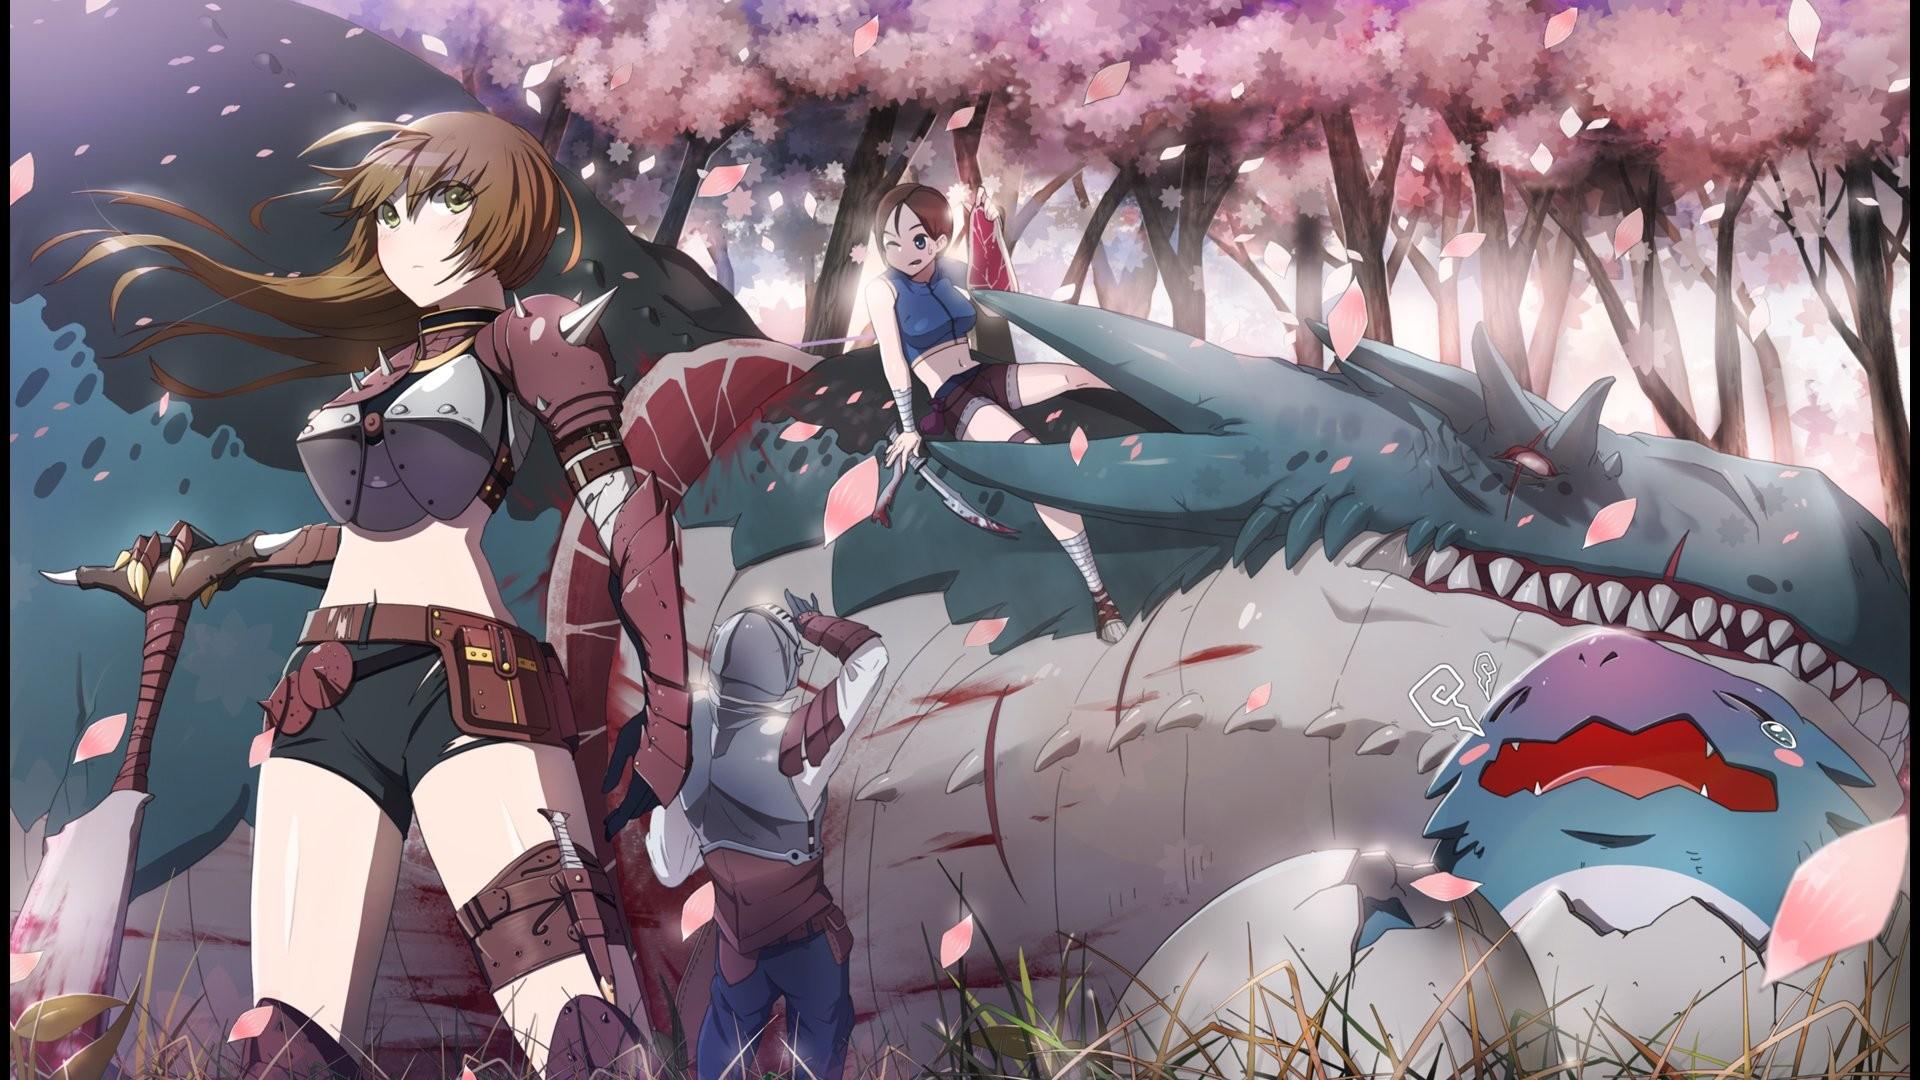 Anime – Original Anime Original (Anime) Girl Warrior Dragon Fantasy Cherry  Blossom Weapon Brown